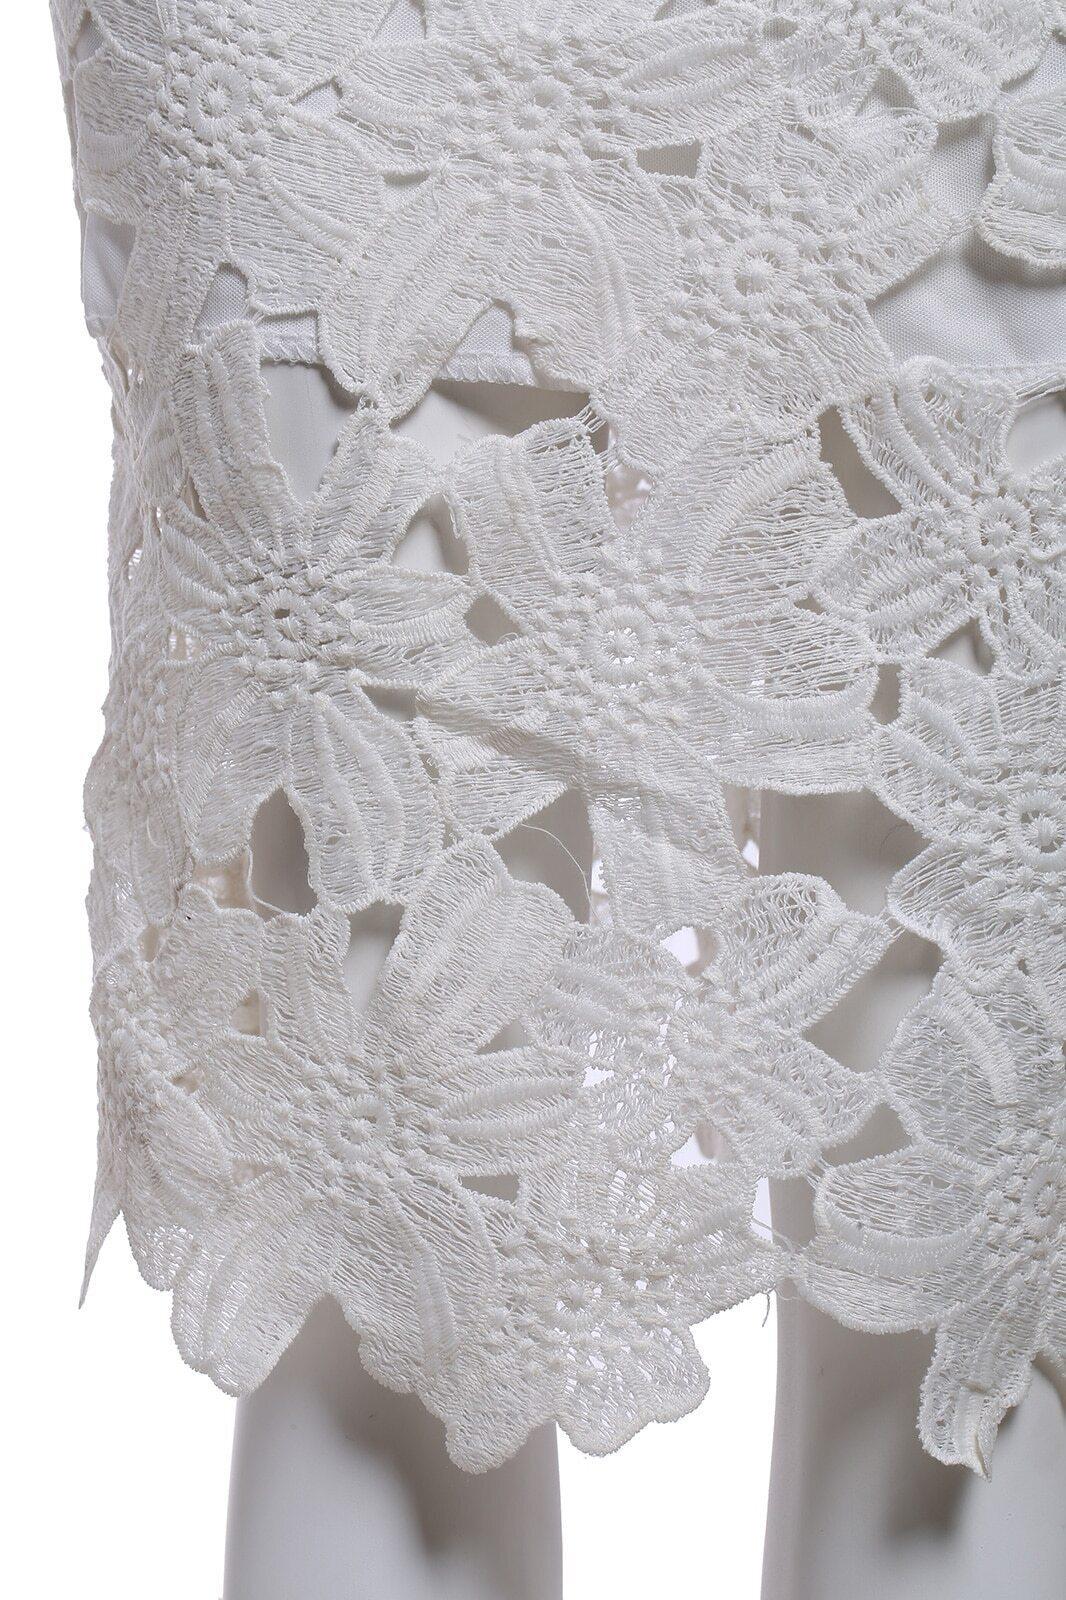 jupe fleur crochet creuse en dentelle blanc french romwe. Black Bedroom Furniture Sets. Home Design Ideas